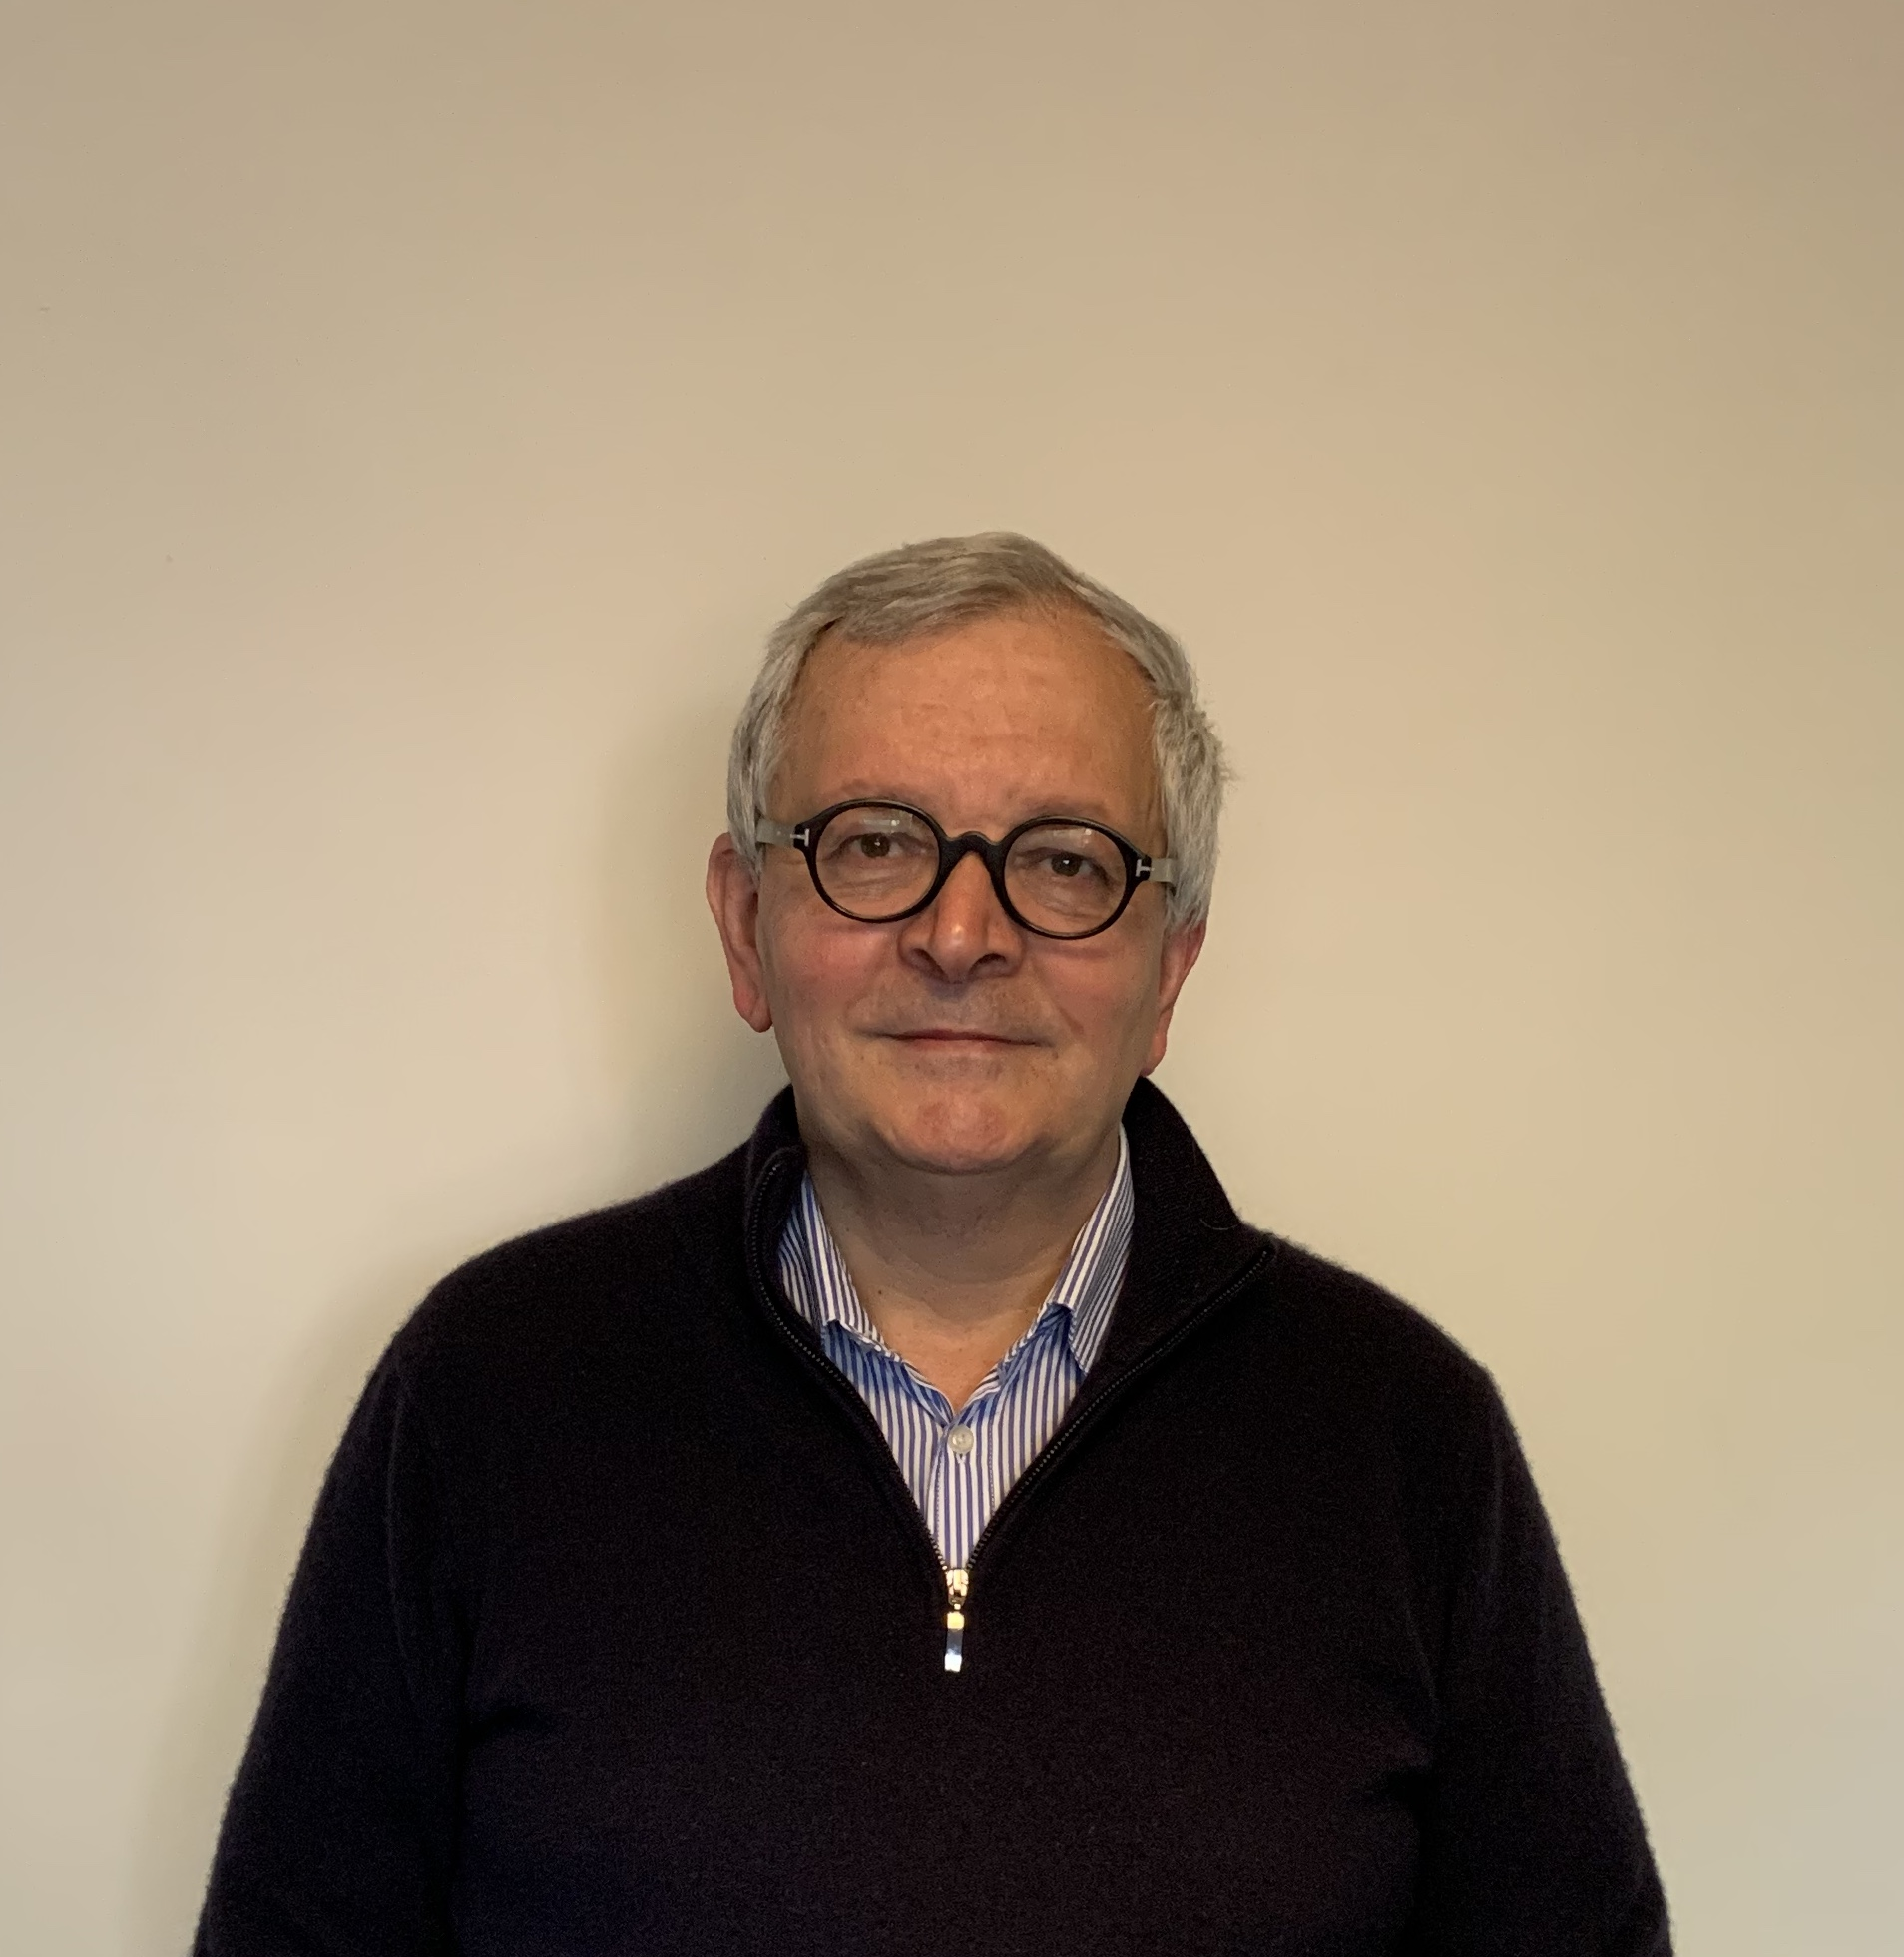 Hubert Carre